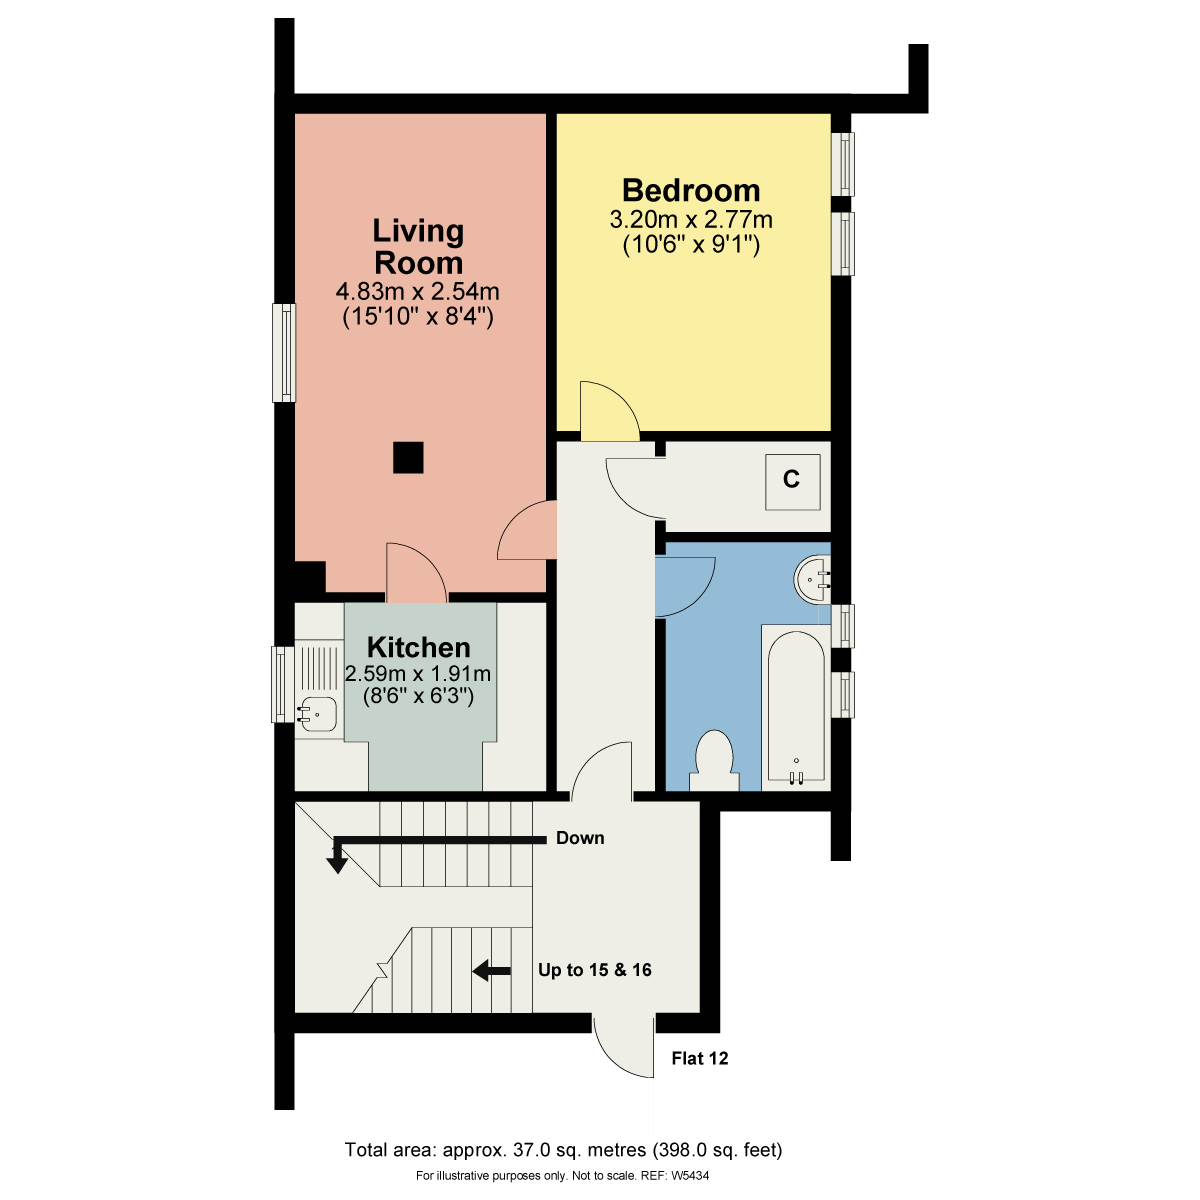 Floorplan 14 Fallbarrow Court, Bowness On Windermere, Cumbria, LA23 3DX